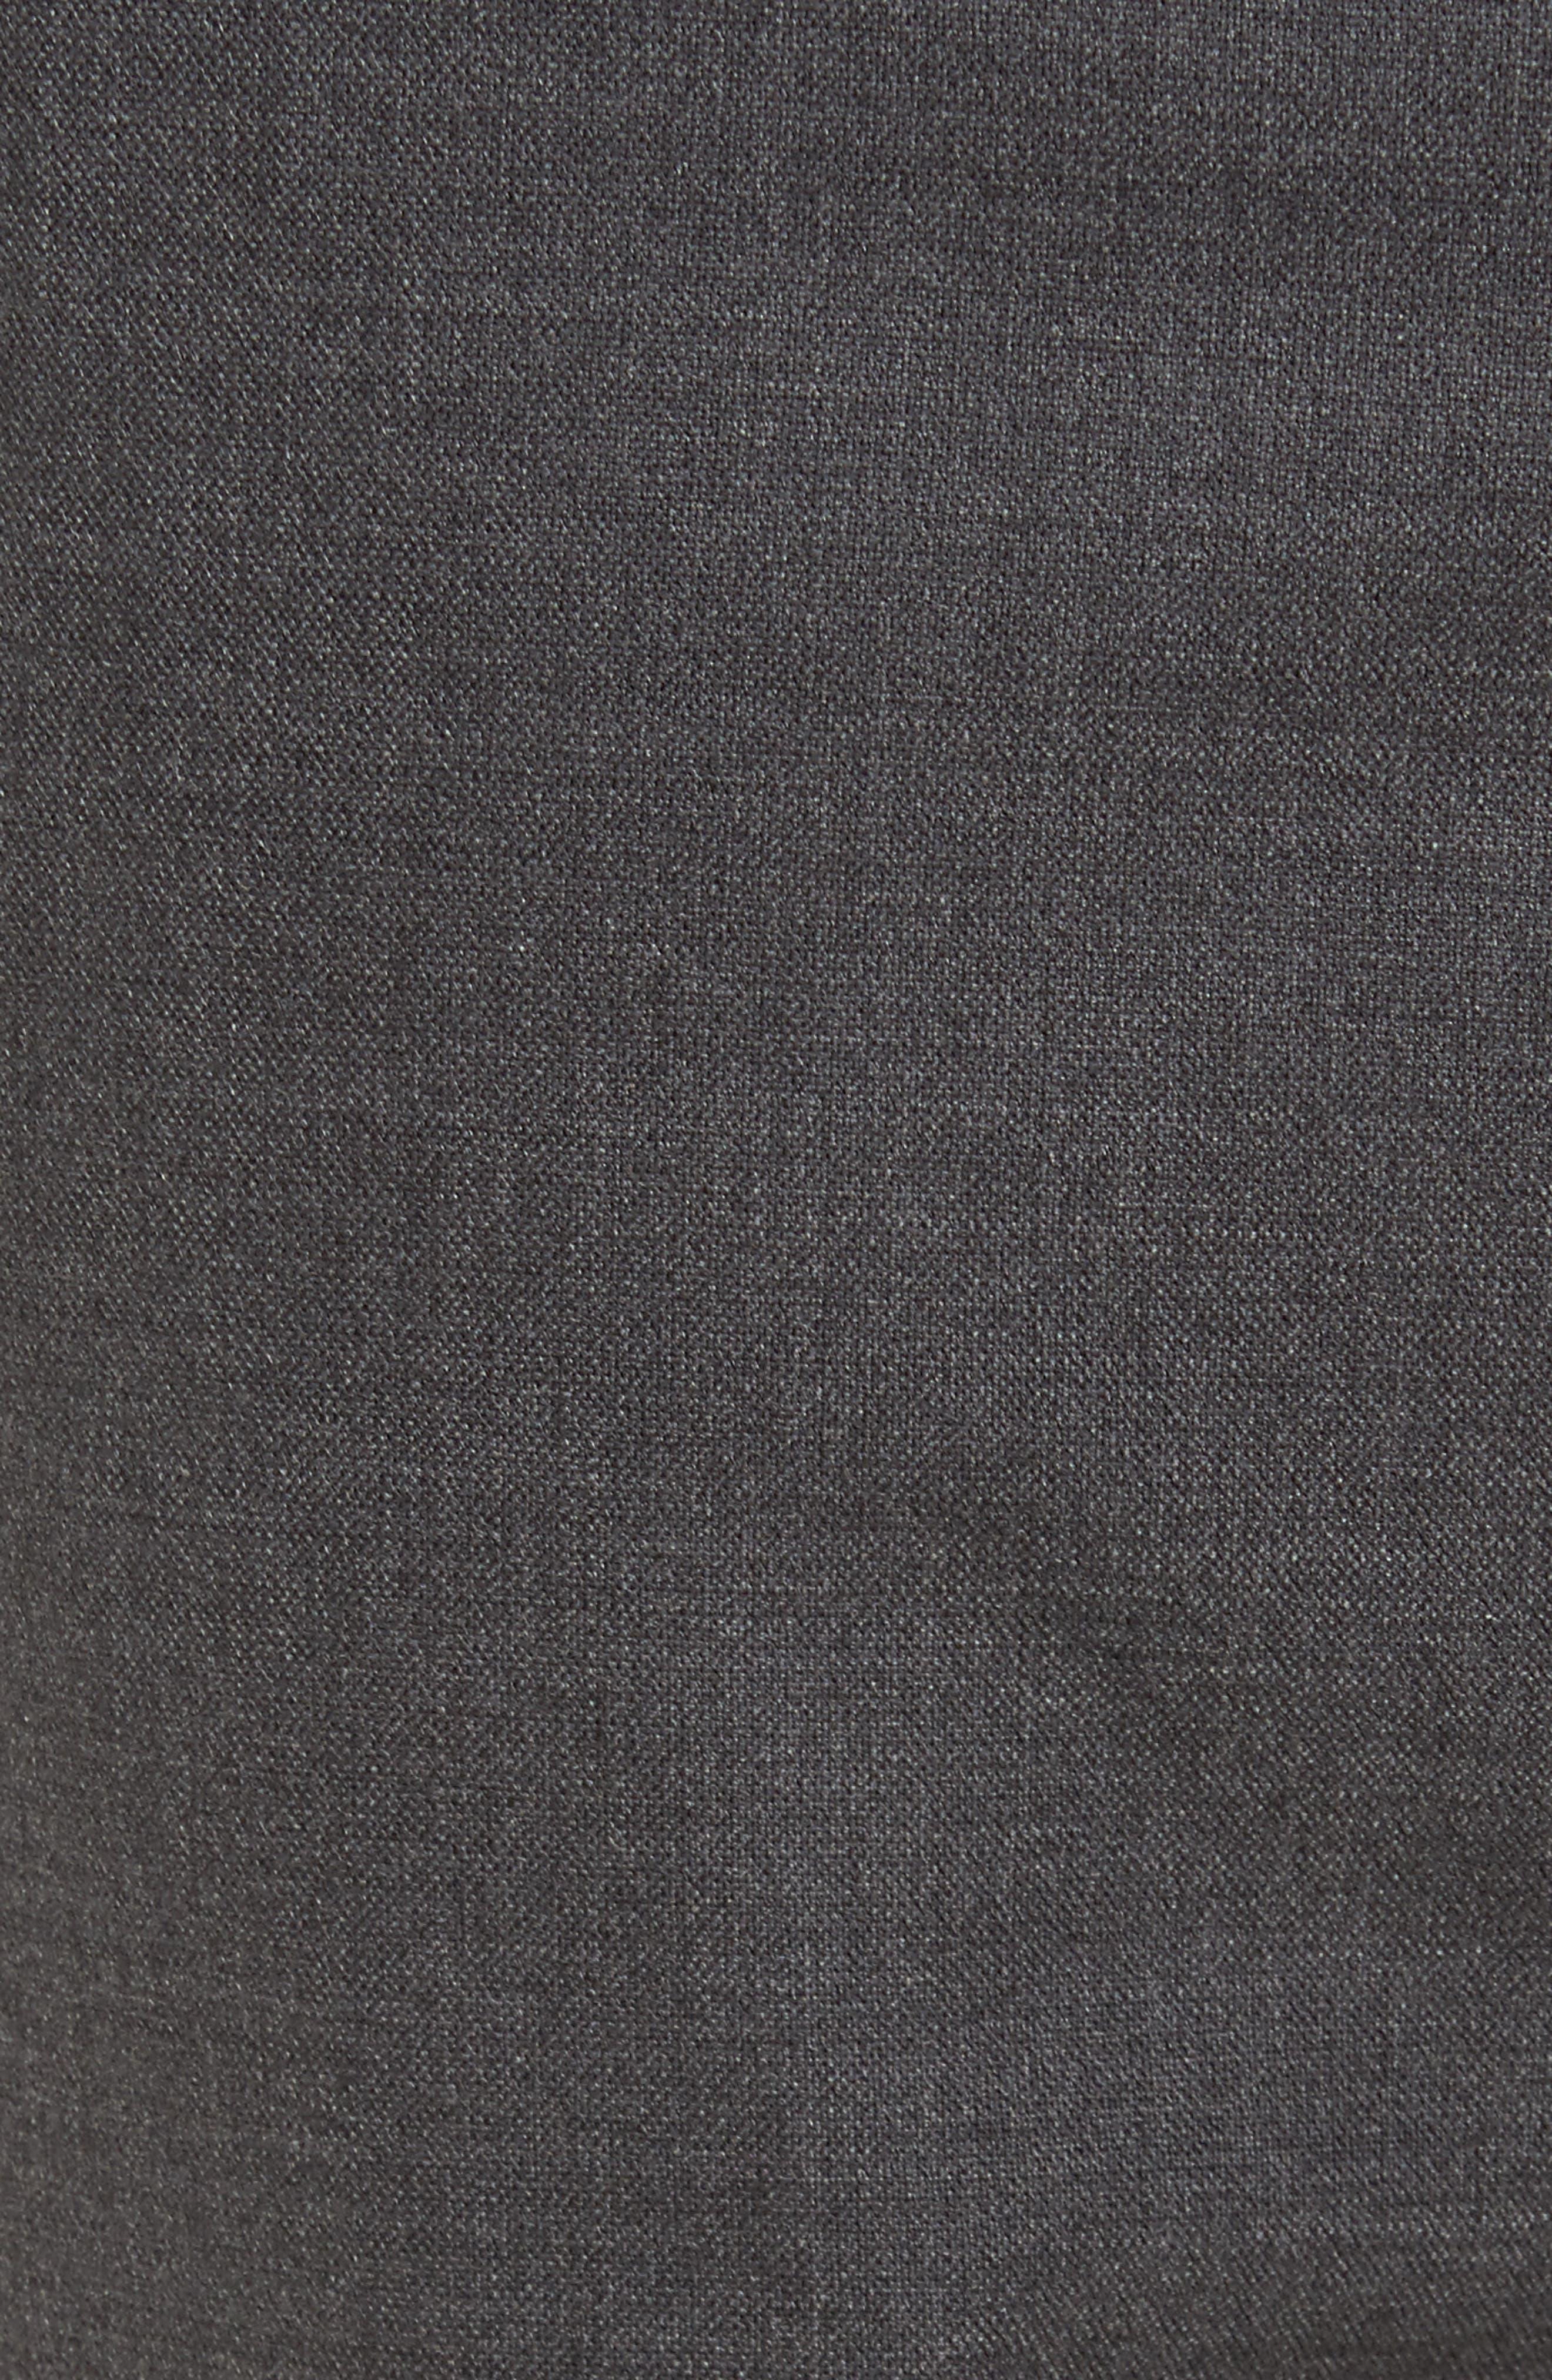 Zaine Gearheart Slim Straight Pants,                             Alternate thumbnail 5, color,                             Medium Charcoal